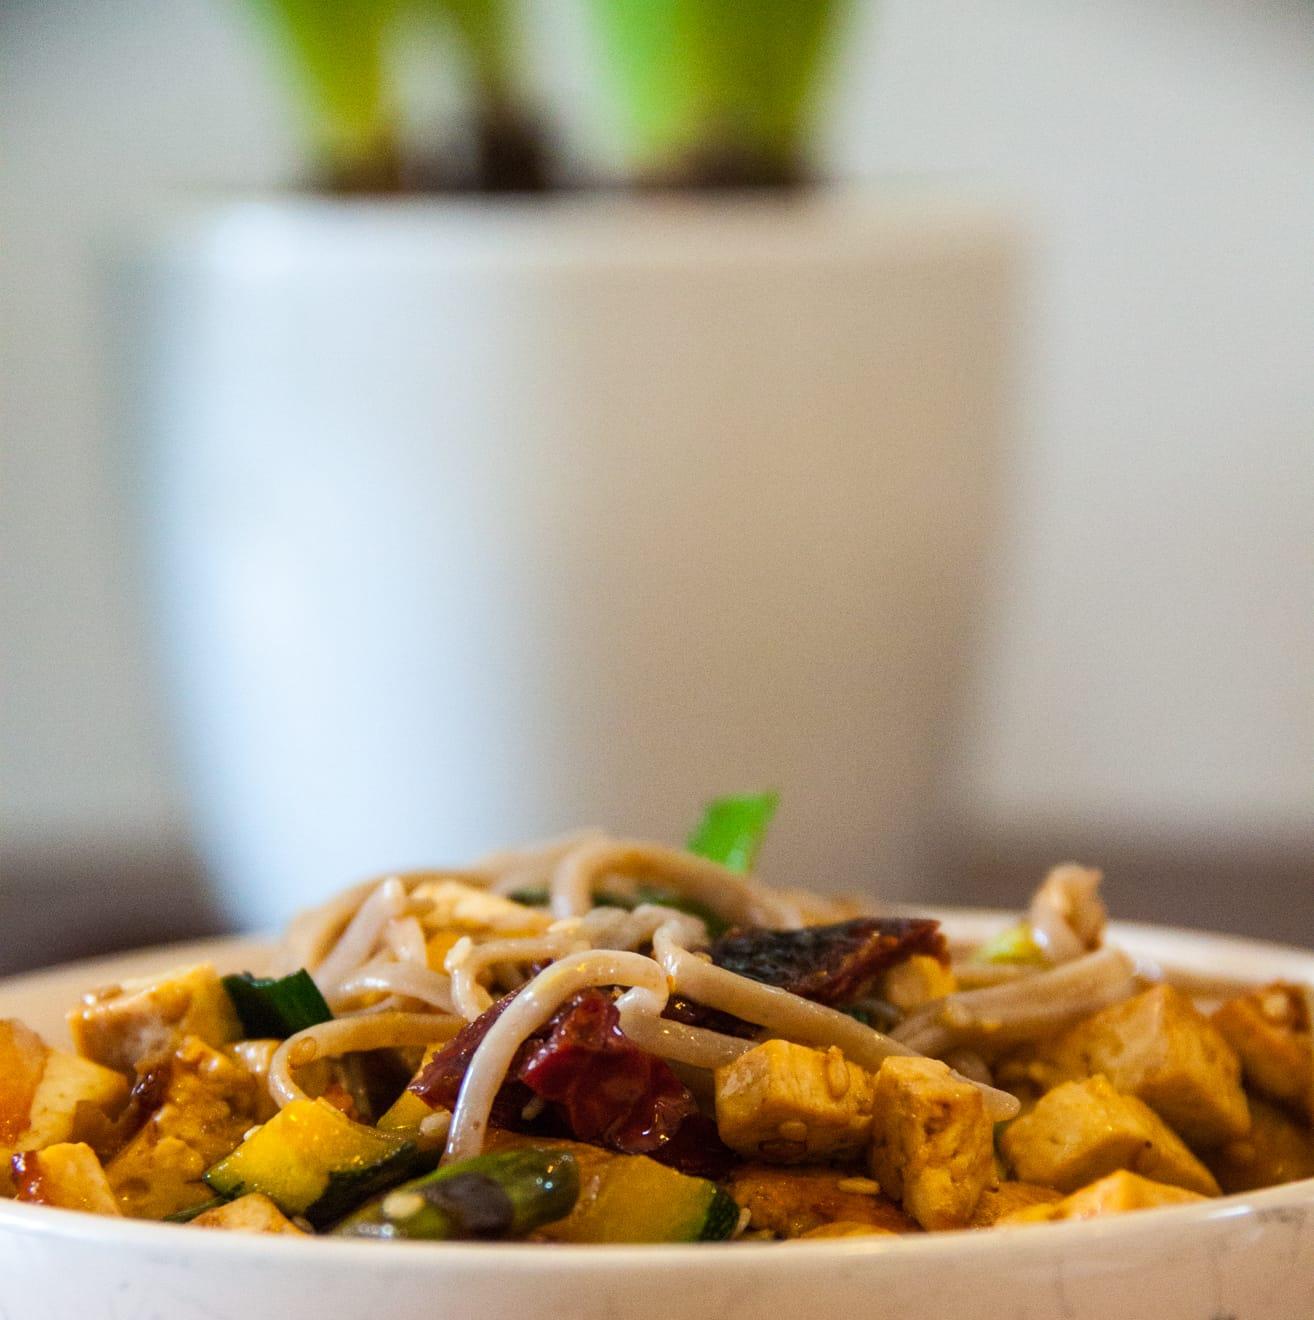 Boekweitnoedels met groenten en tofu